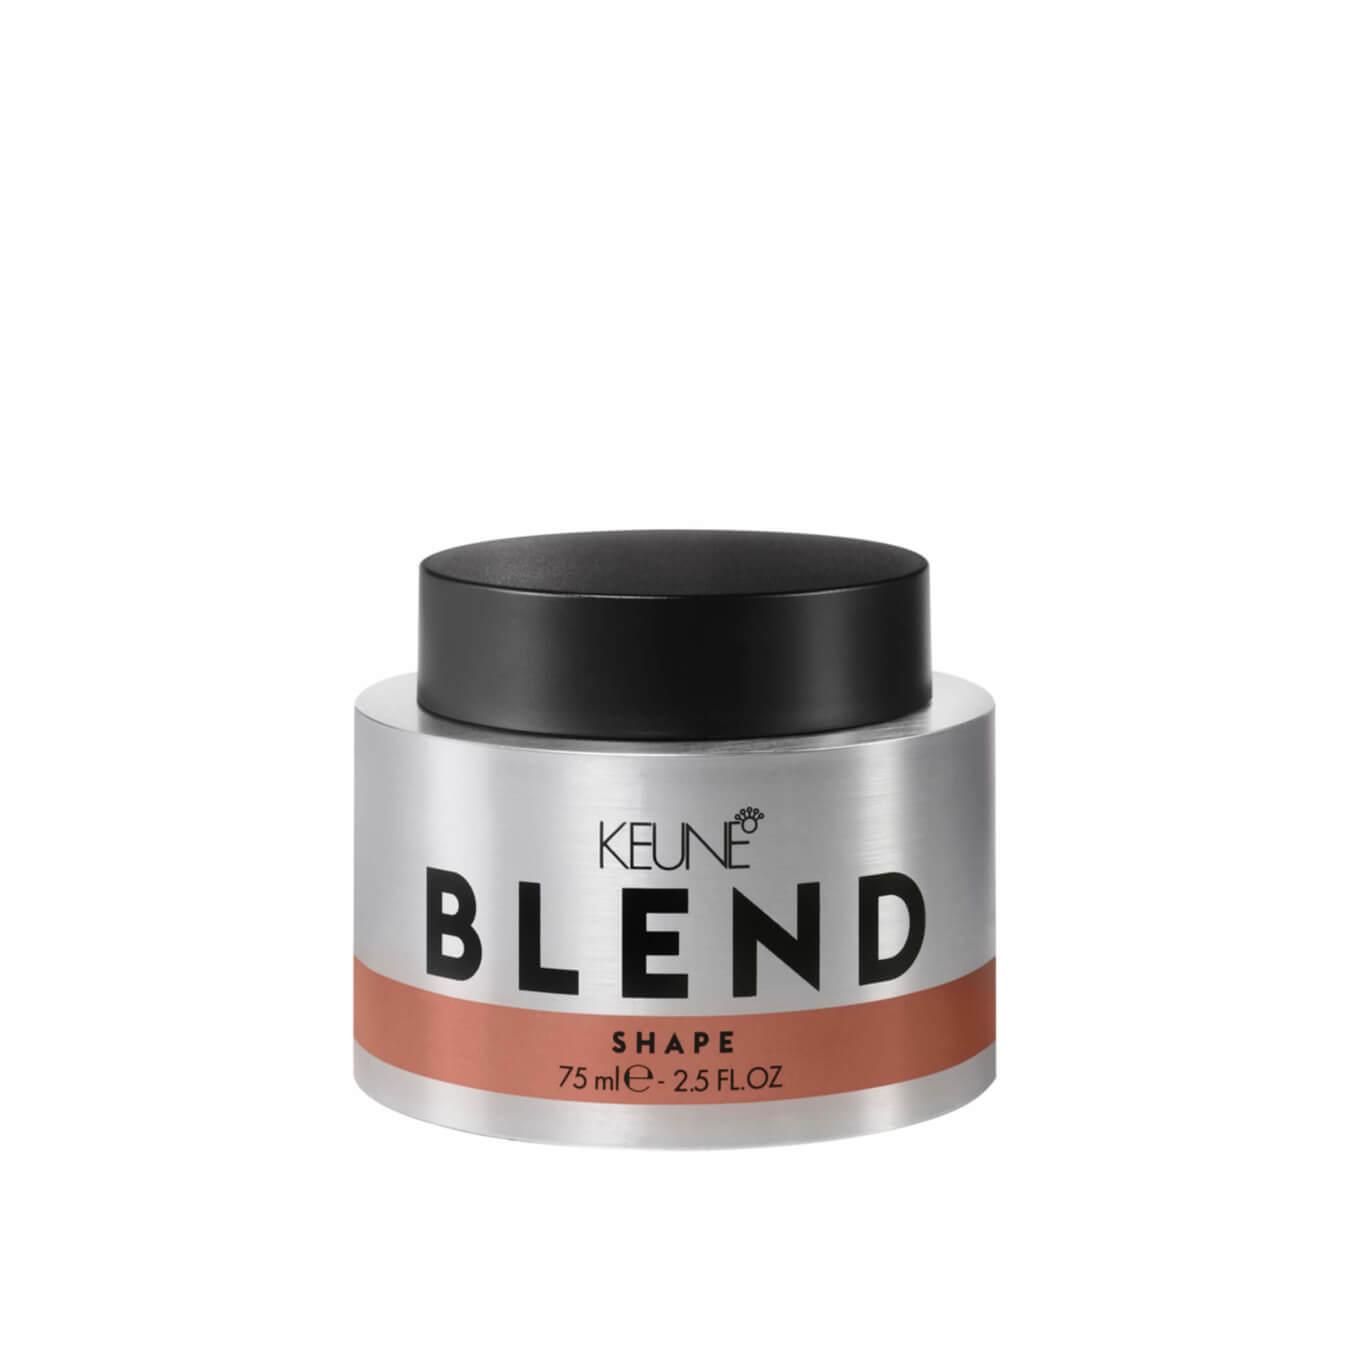 Koop Keune Blend Shape 75ml